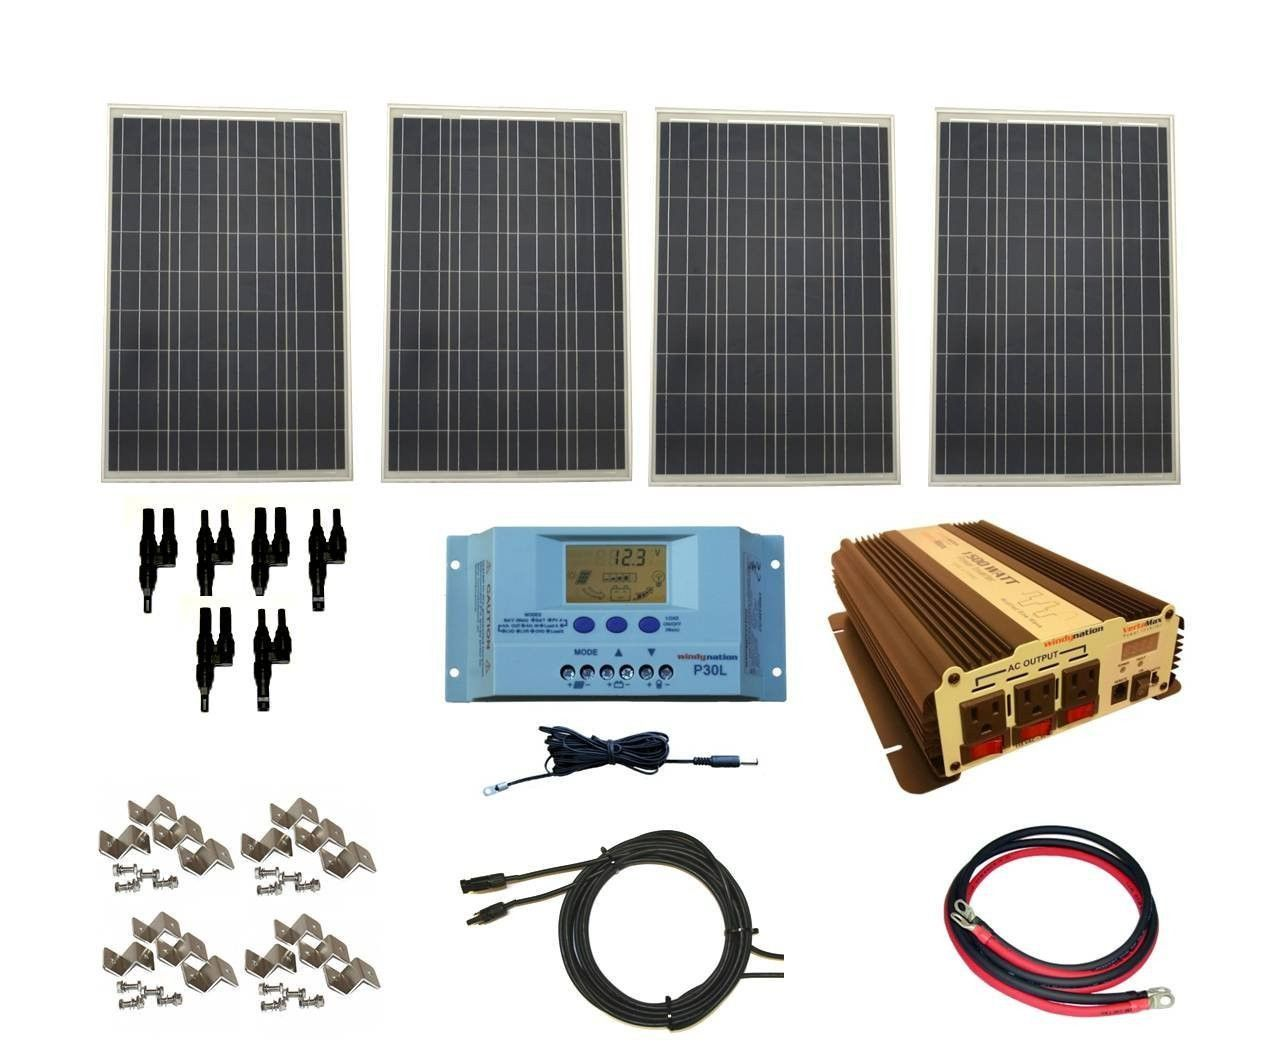 Complete 400 Watt Solar Panel Kit With 1500 Watt Vertamax Power Inverter For Rv Off Grid Solar Panels For Home Solar Energy Panels Solar Panels